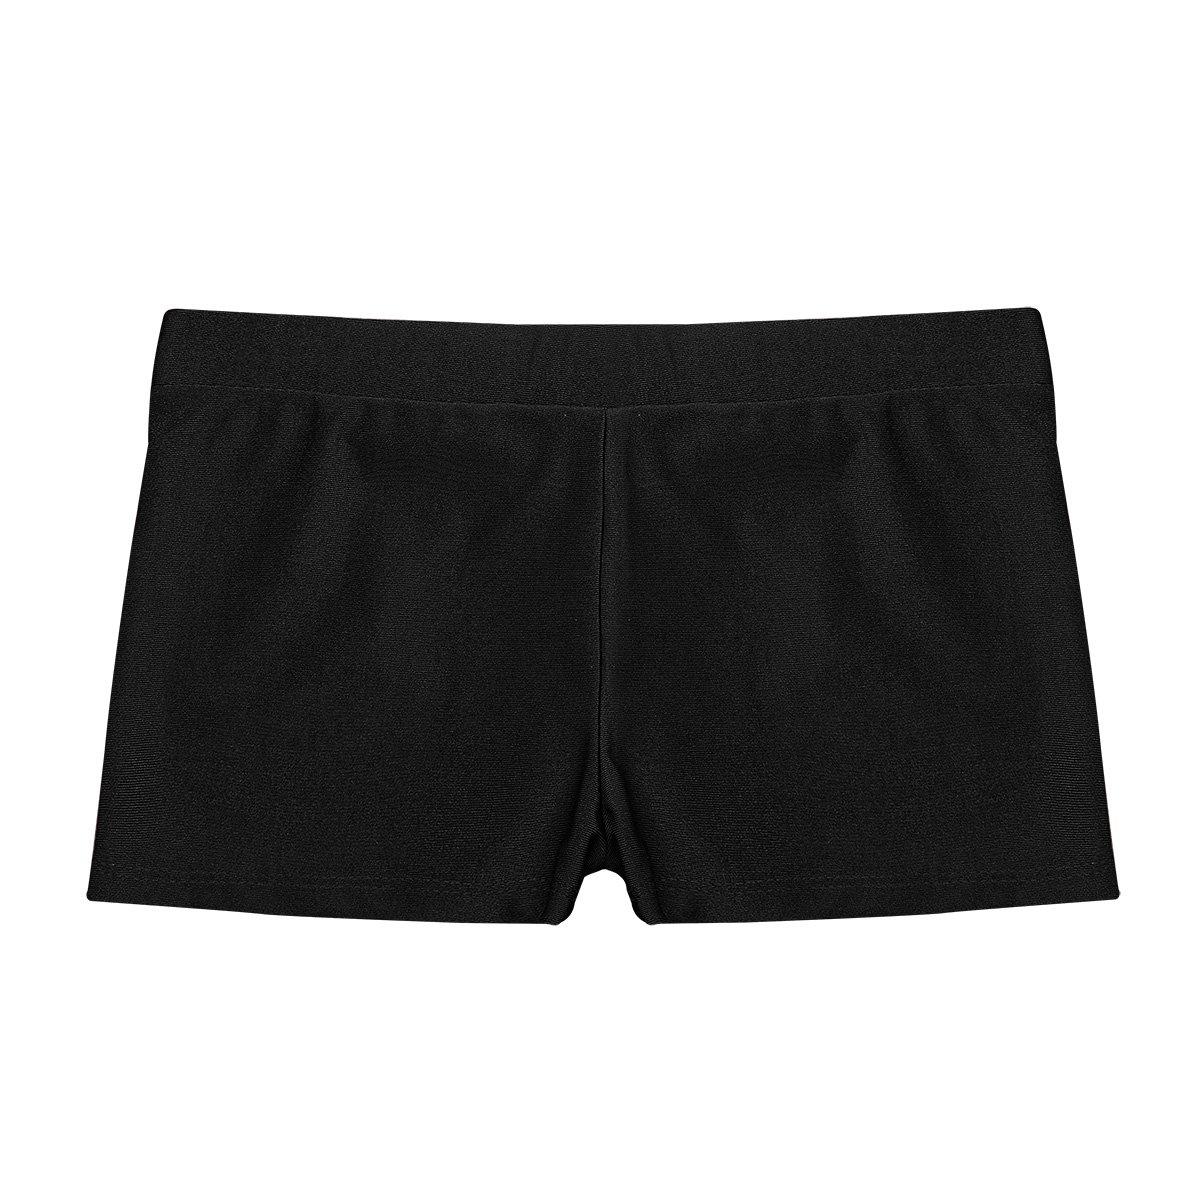 9282e7a450f1a TiaoBug Children's Gymnastics Gym Lycra Dance Girls Stretch Neon Shorts Hot  Pants: Amazon.co.uk: Sports & Outdoors